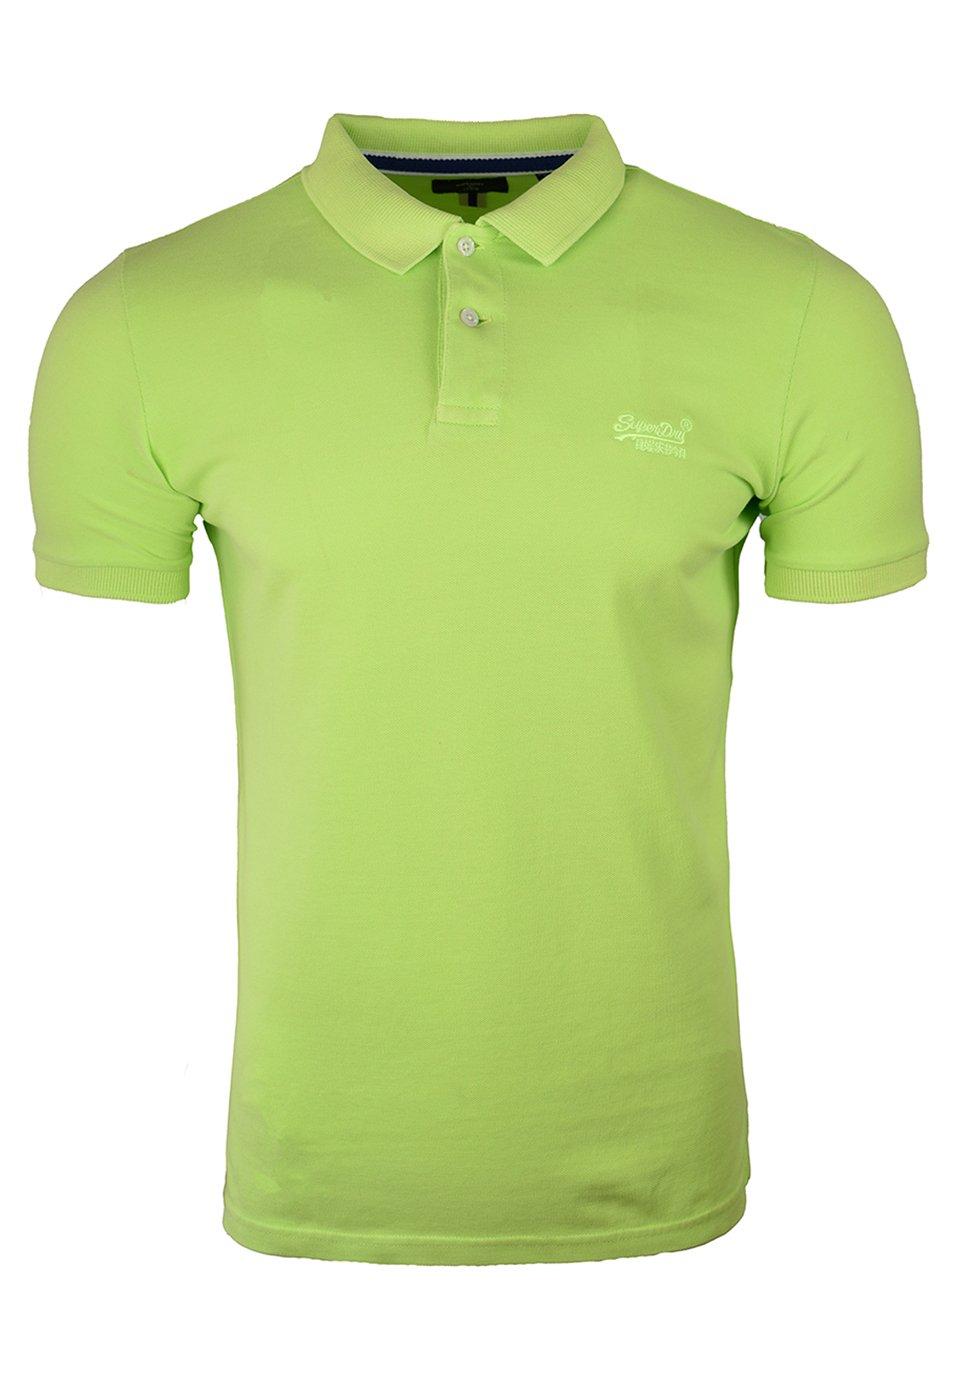 Men S/S VINTAGE DESTROYED - Polo shirt